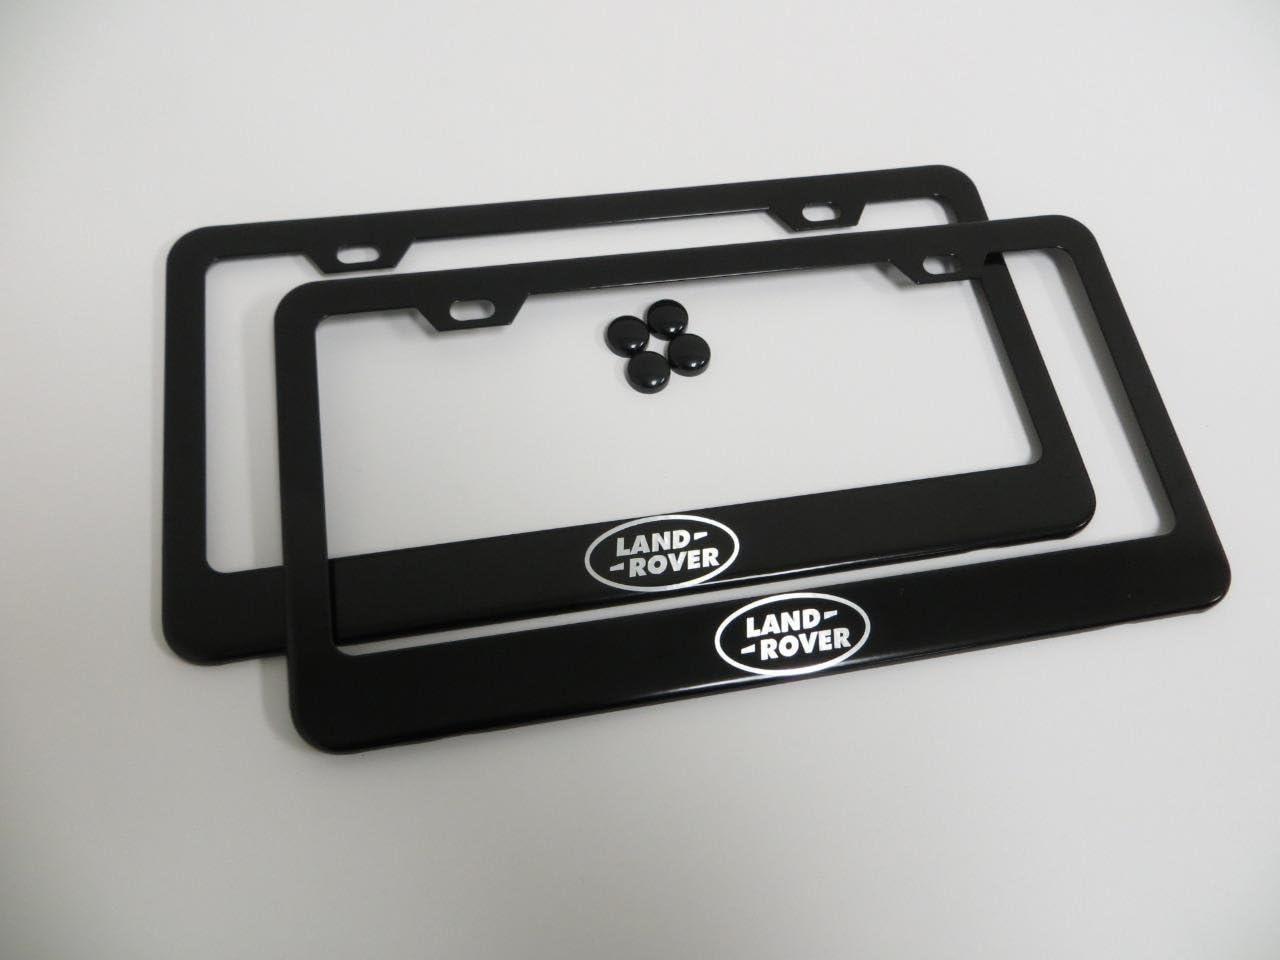 LANDROVER *LOGO* BLACK Metal License Plate Frame Tag Holder with Caps